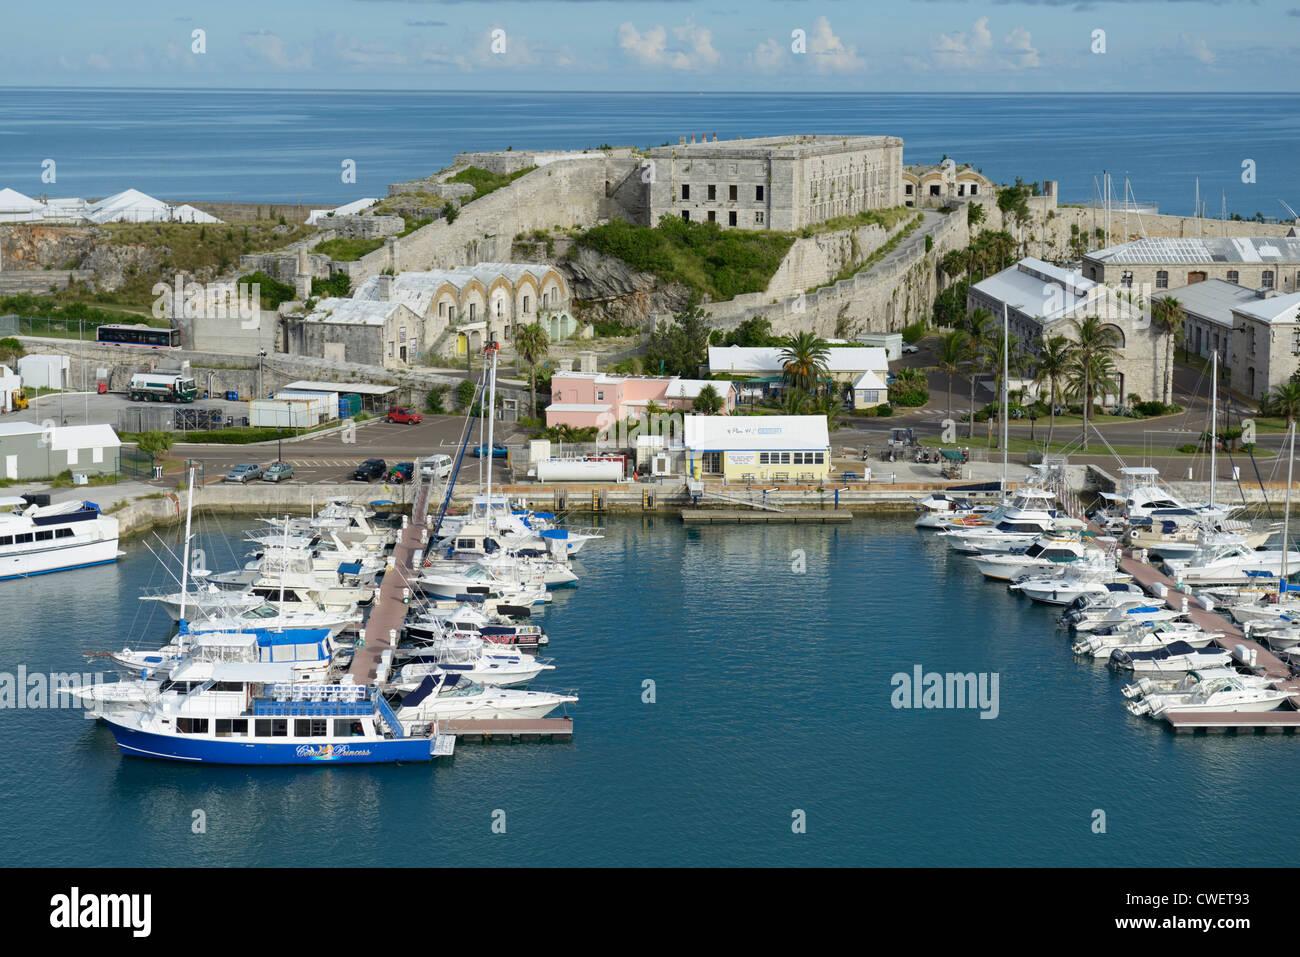 Royal Navy Dockyard Marina, Bermuda,  view from a cruise ship docked at King's Wharf - Stock Image